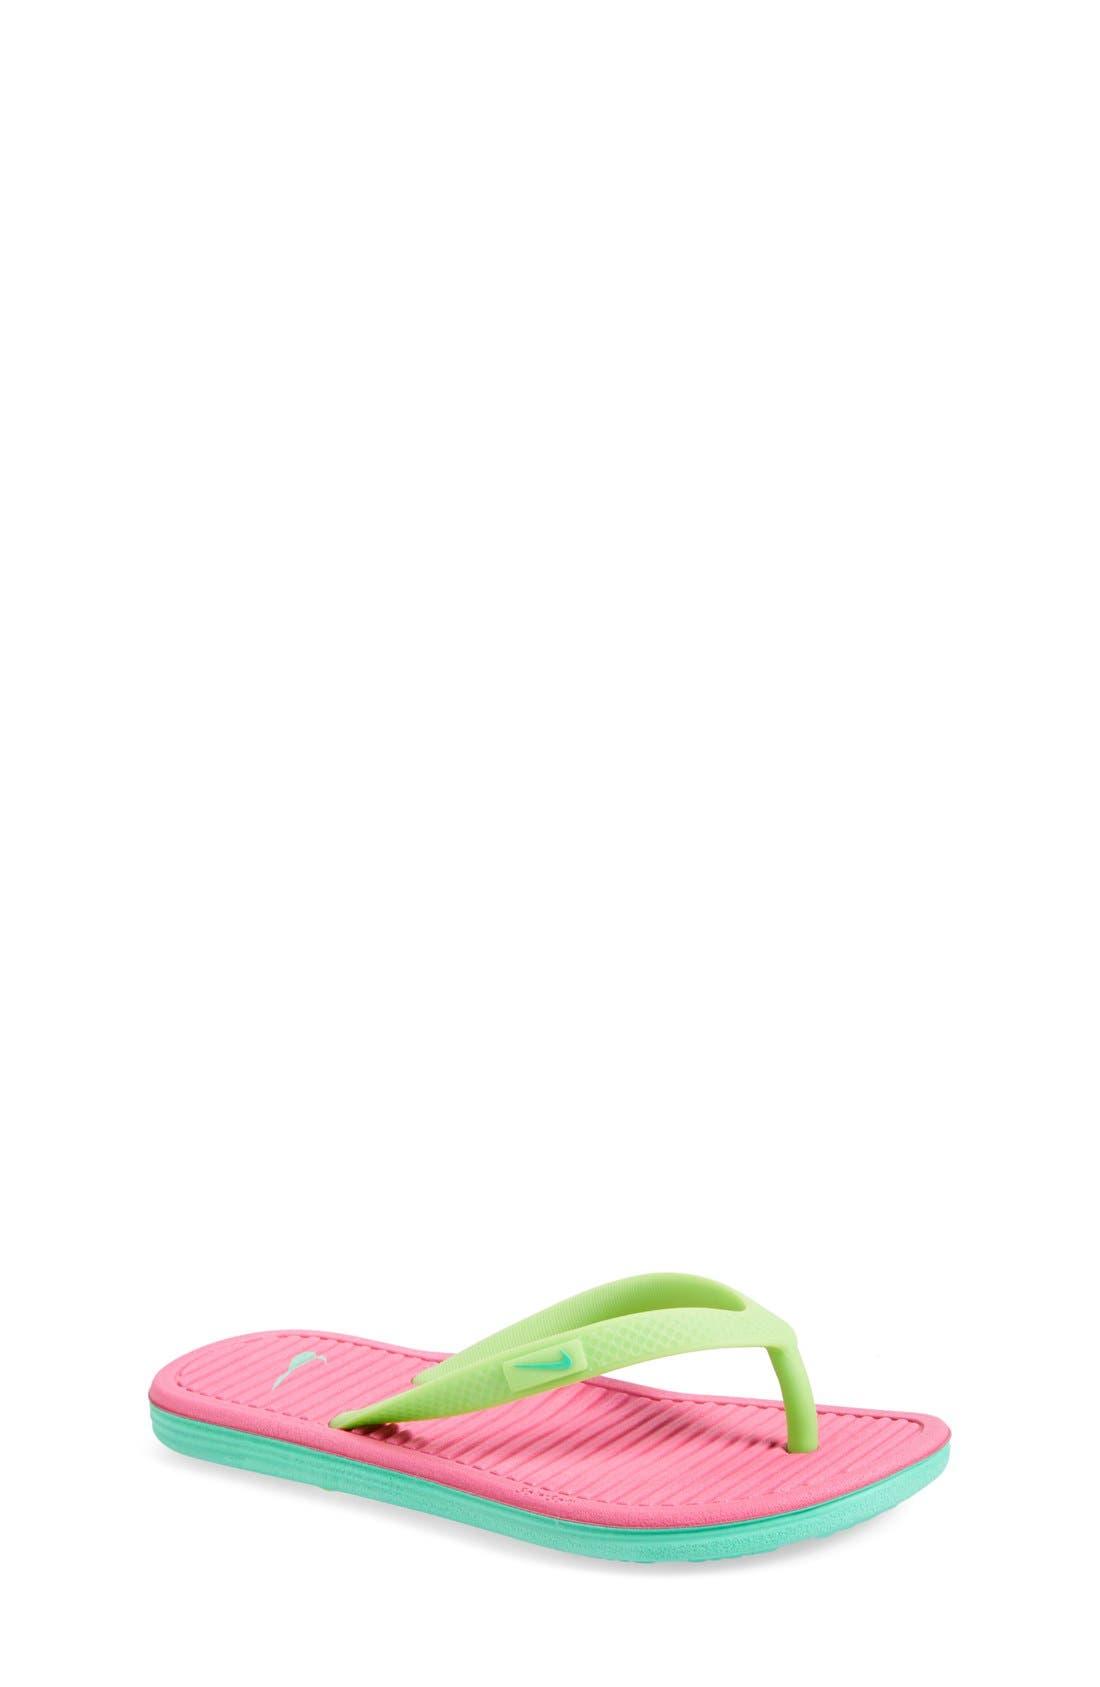 Main Image - Nike 'SolarSoft 2' Sandal (Toddler, Little Kid & Big Kid)